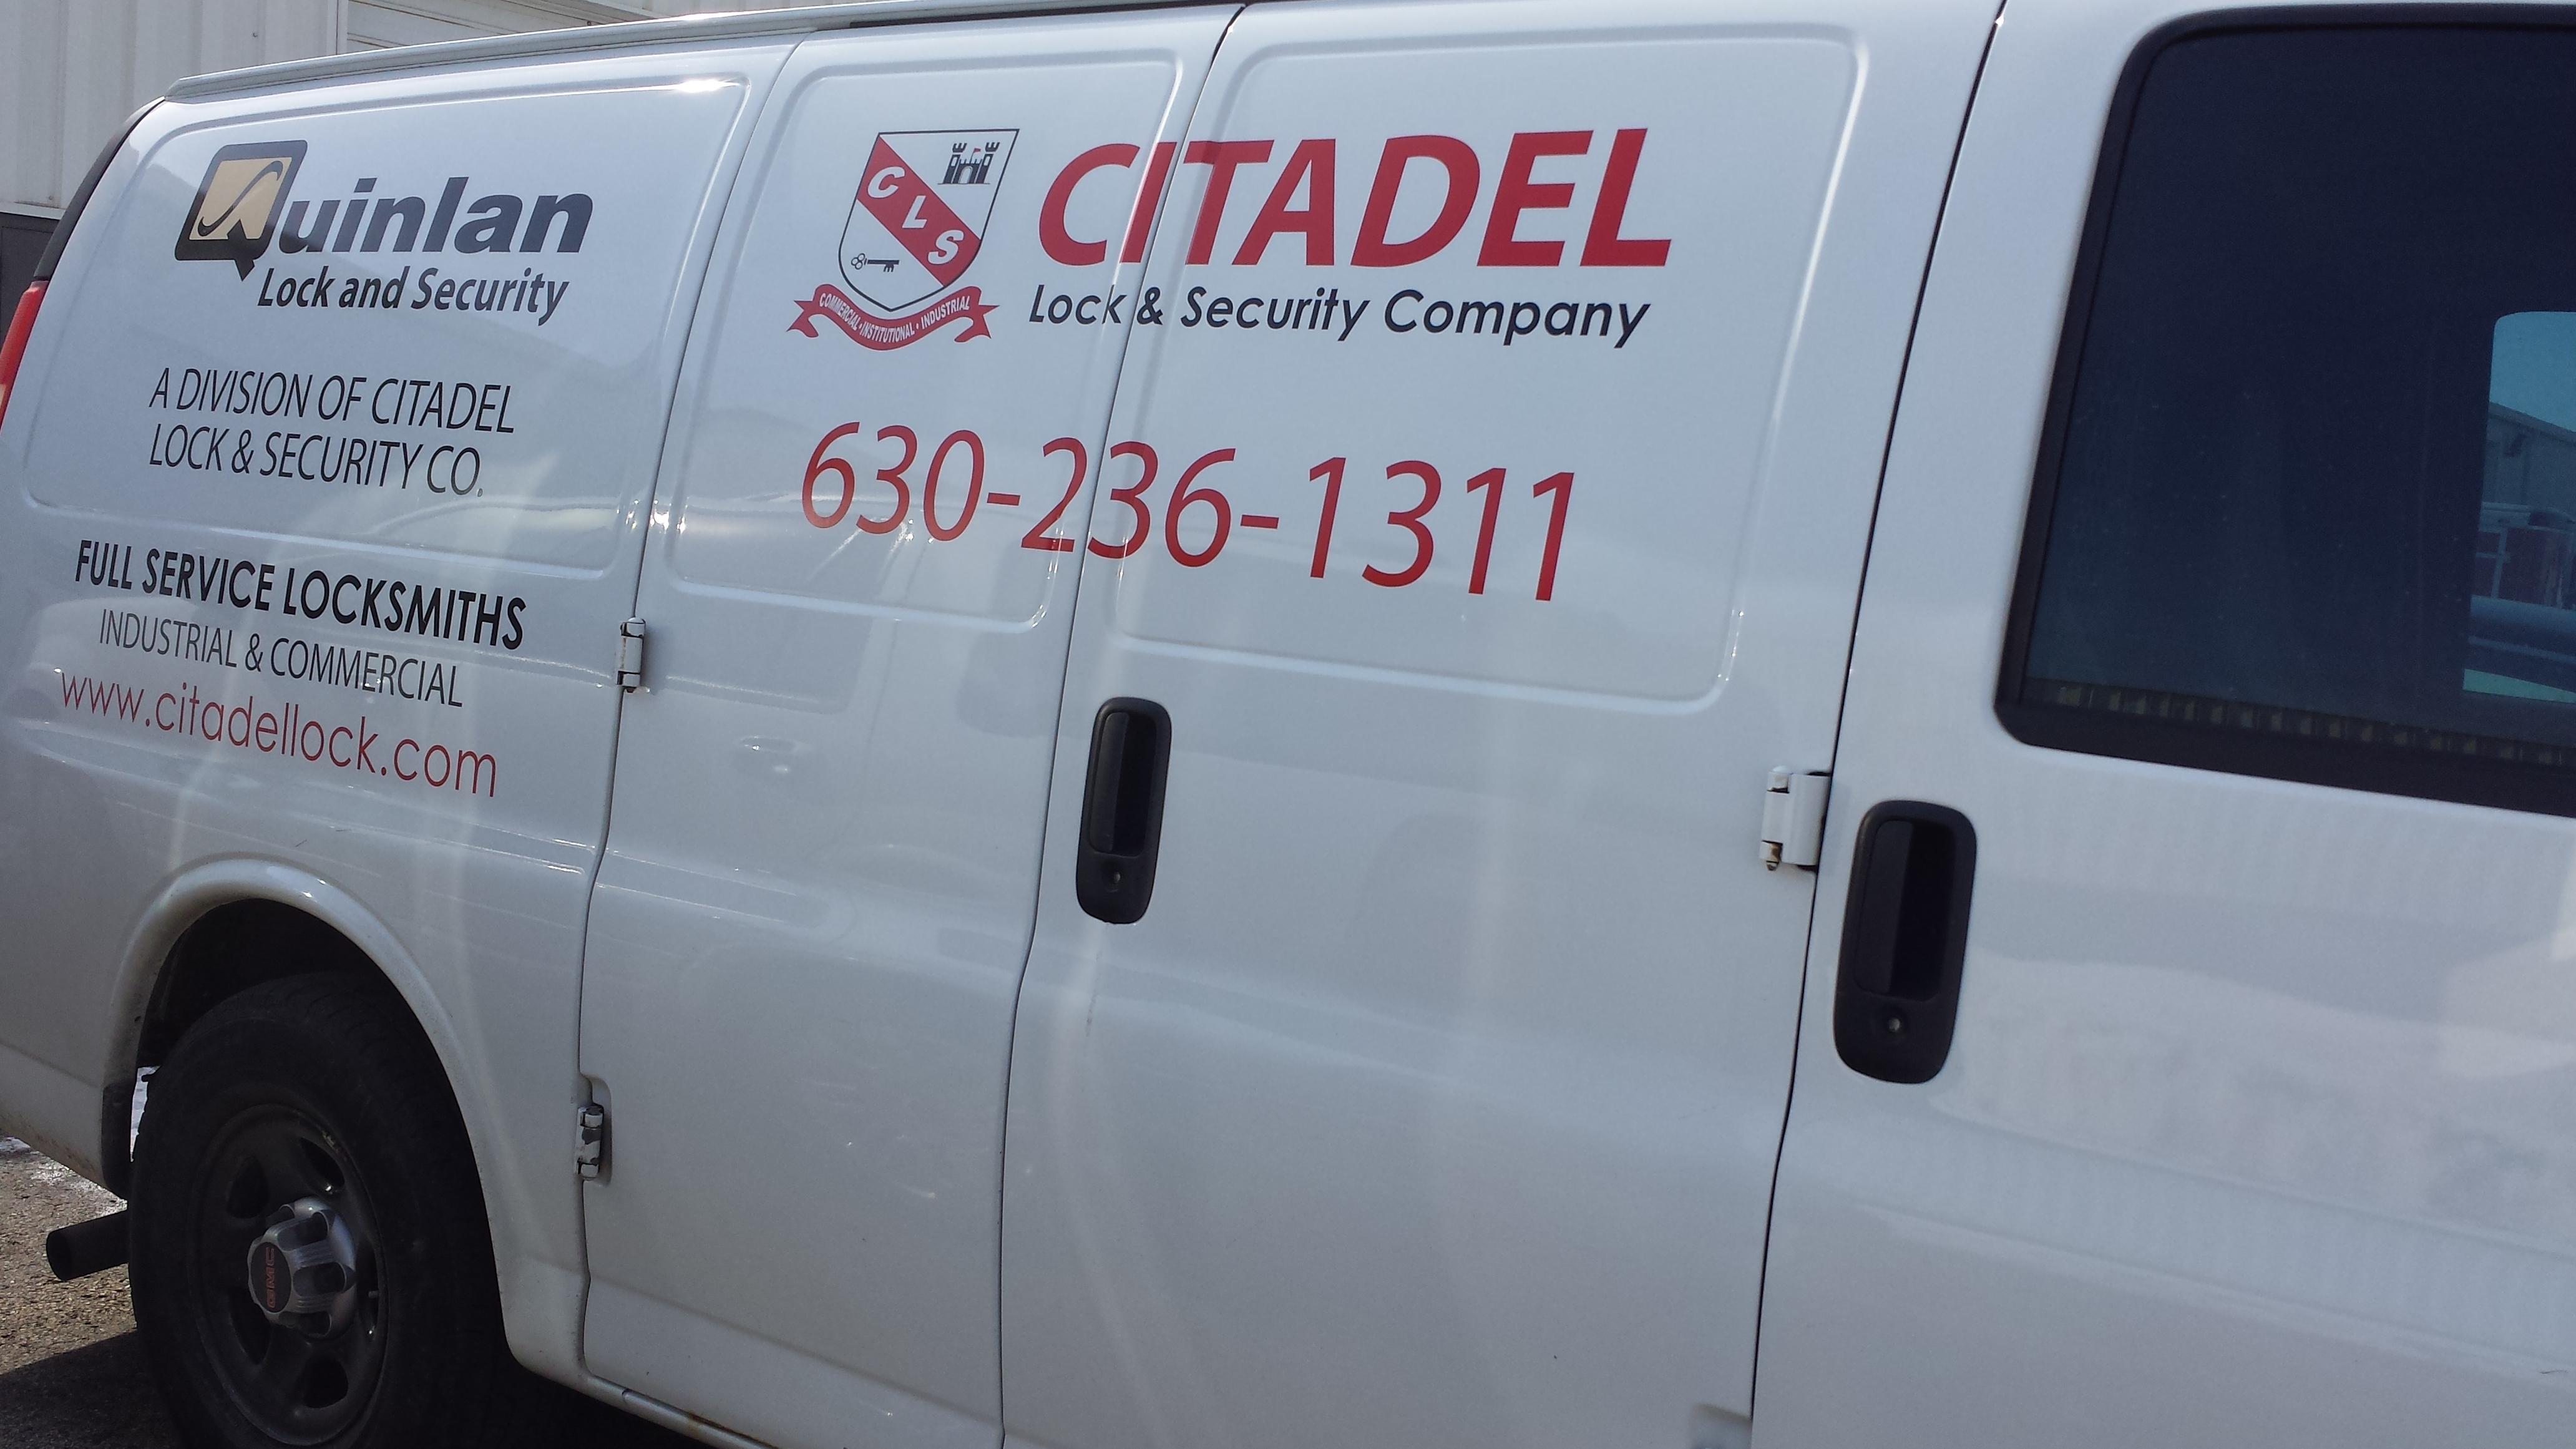 Citadel Lock & Security Company image 3